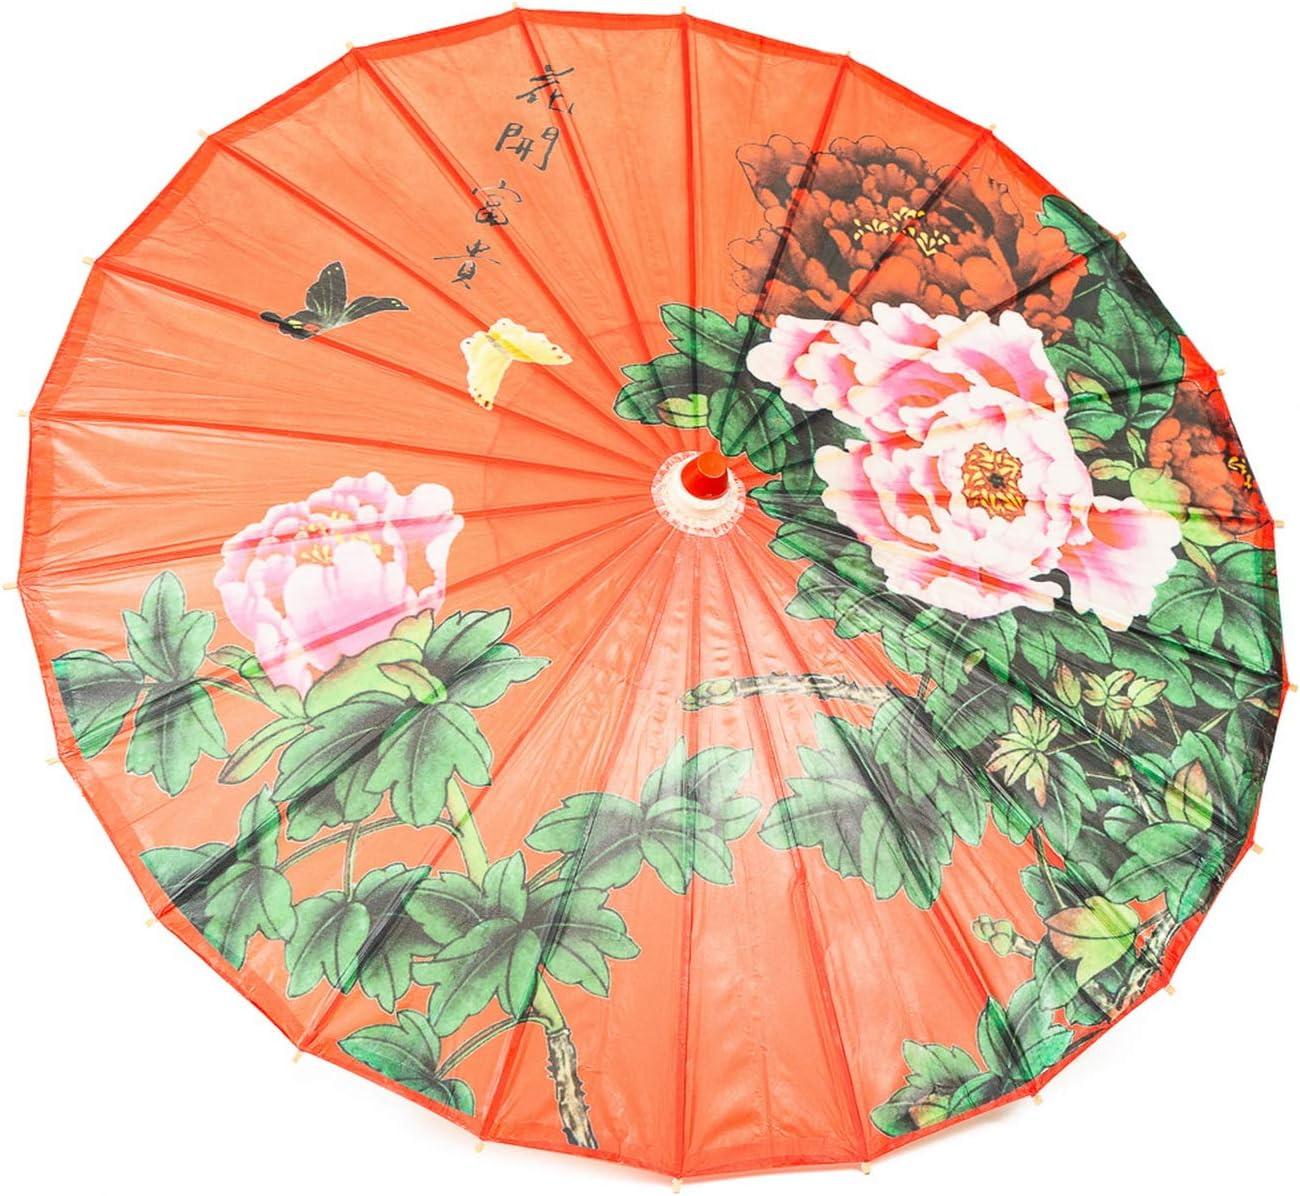 "ASIAN HOME Rainproof Handmade Chinese Oiled Paper Umbrella Parasol 33"" Peony"